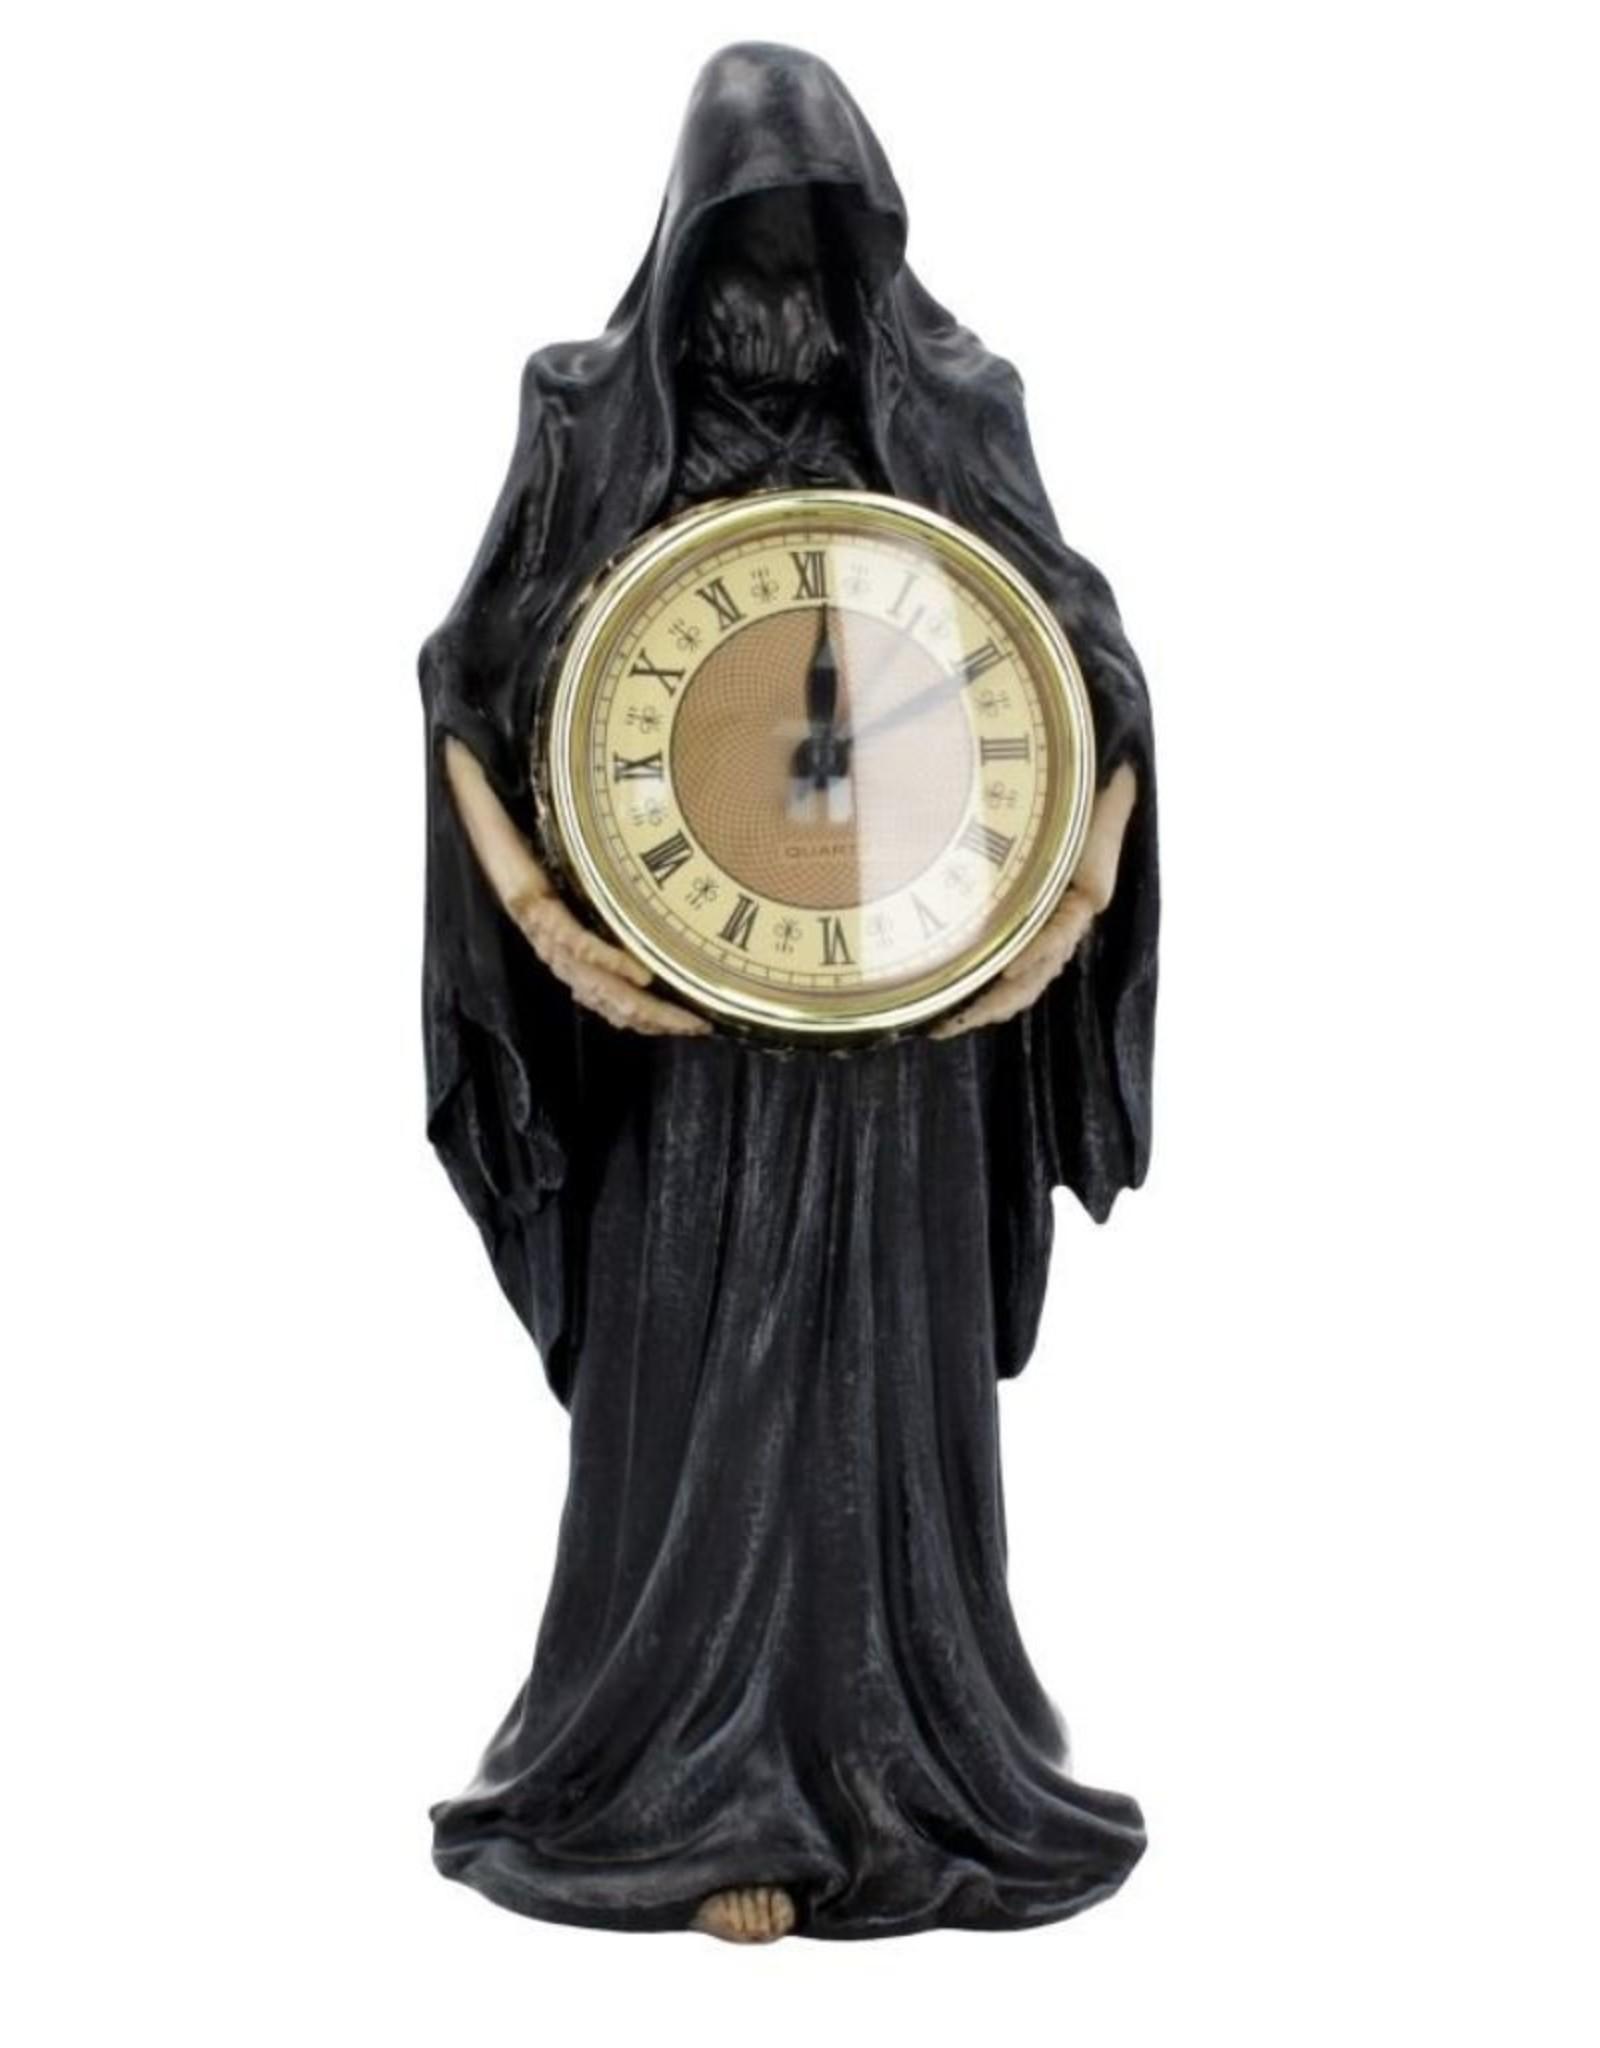 Alator Giftware & Lifestyle - Final Hour Magere Hein Tafelklok